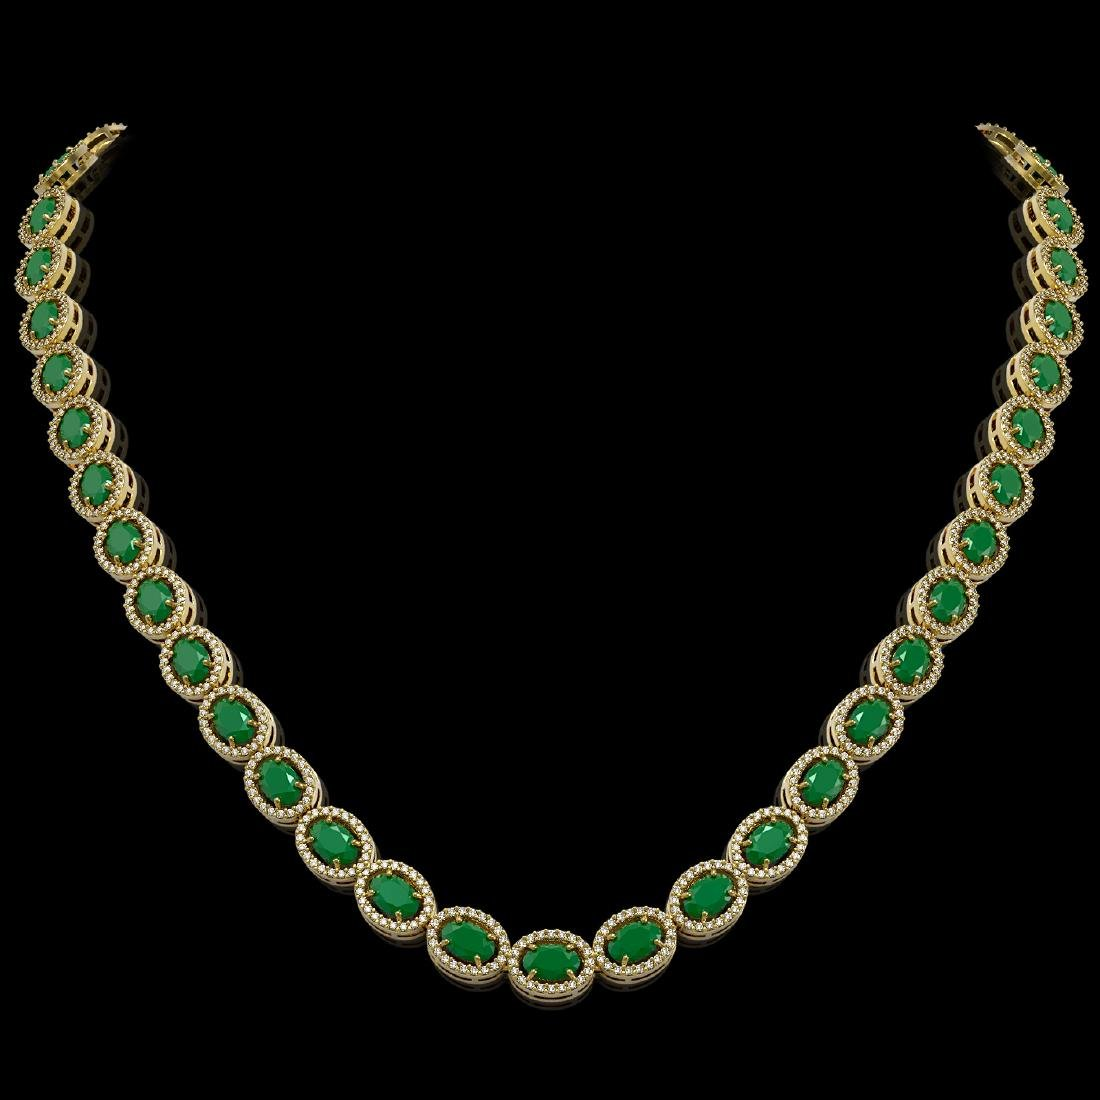 34.11 CTW Emerald & Diamond Halo Necklace 10K Yellow